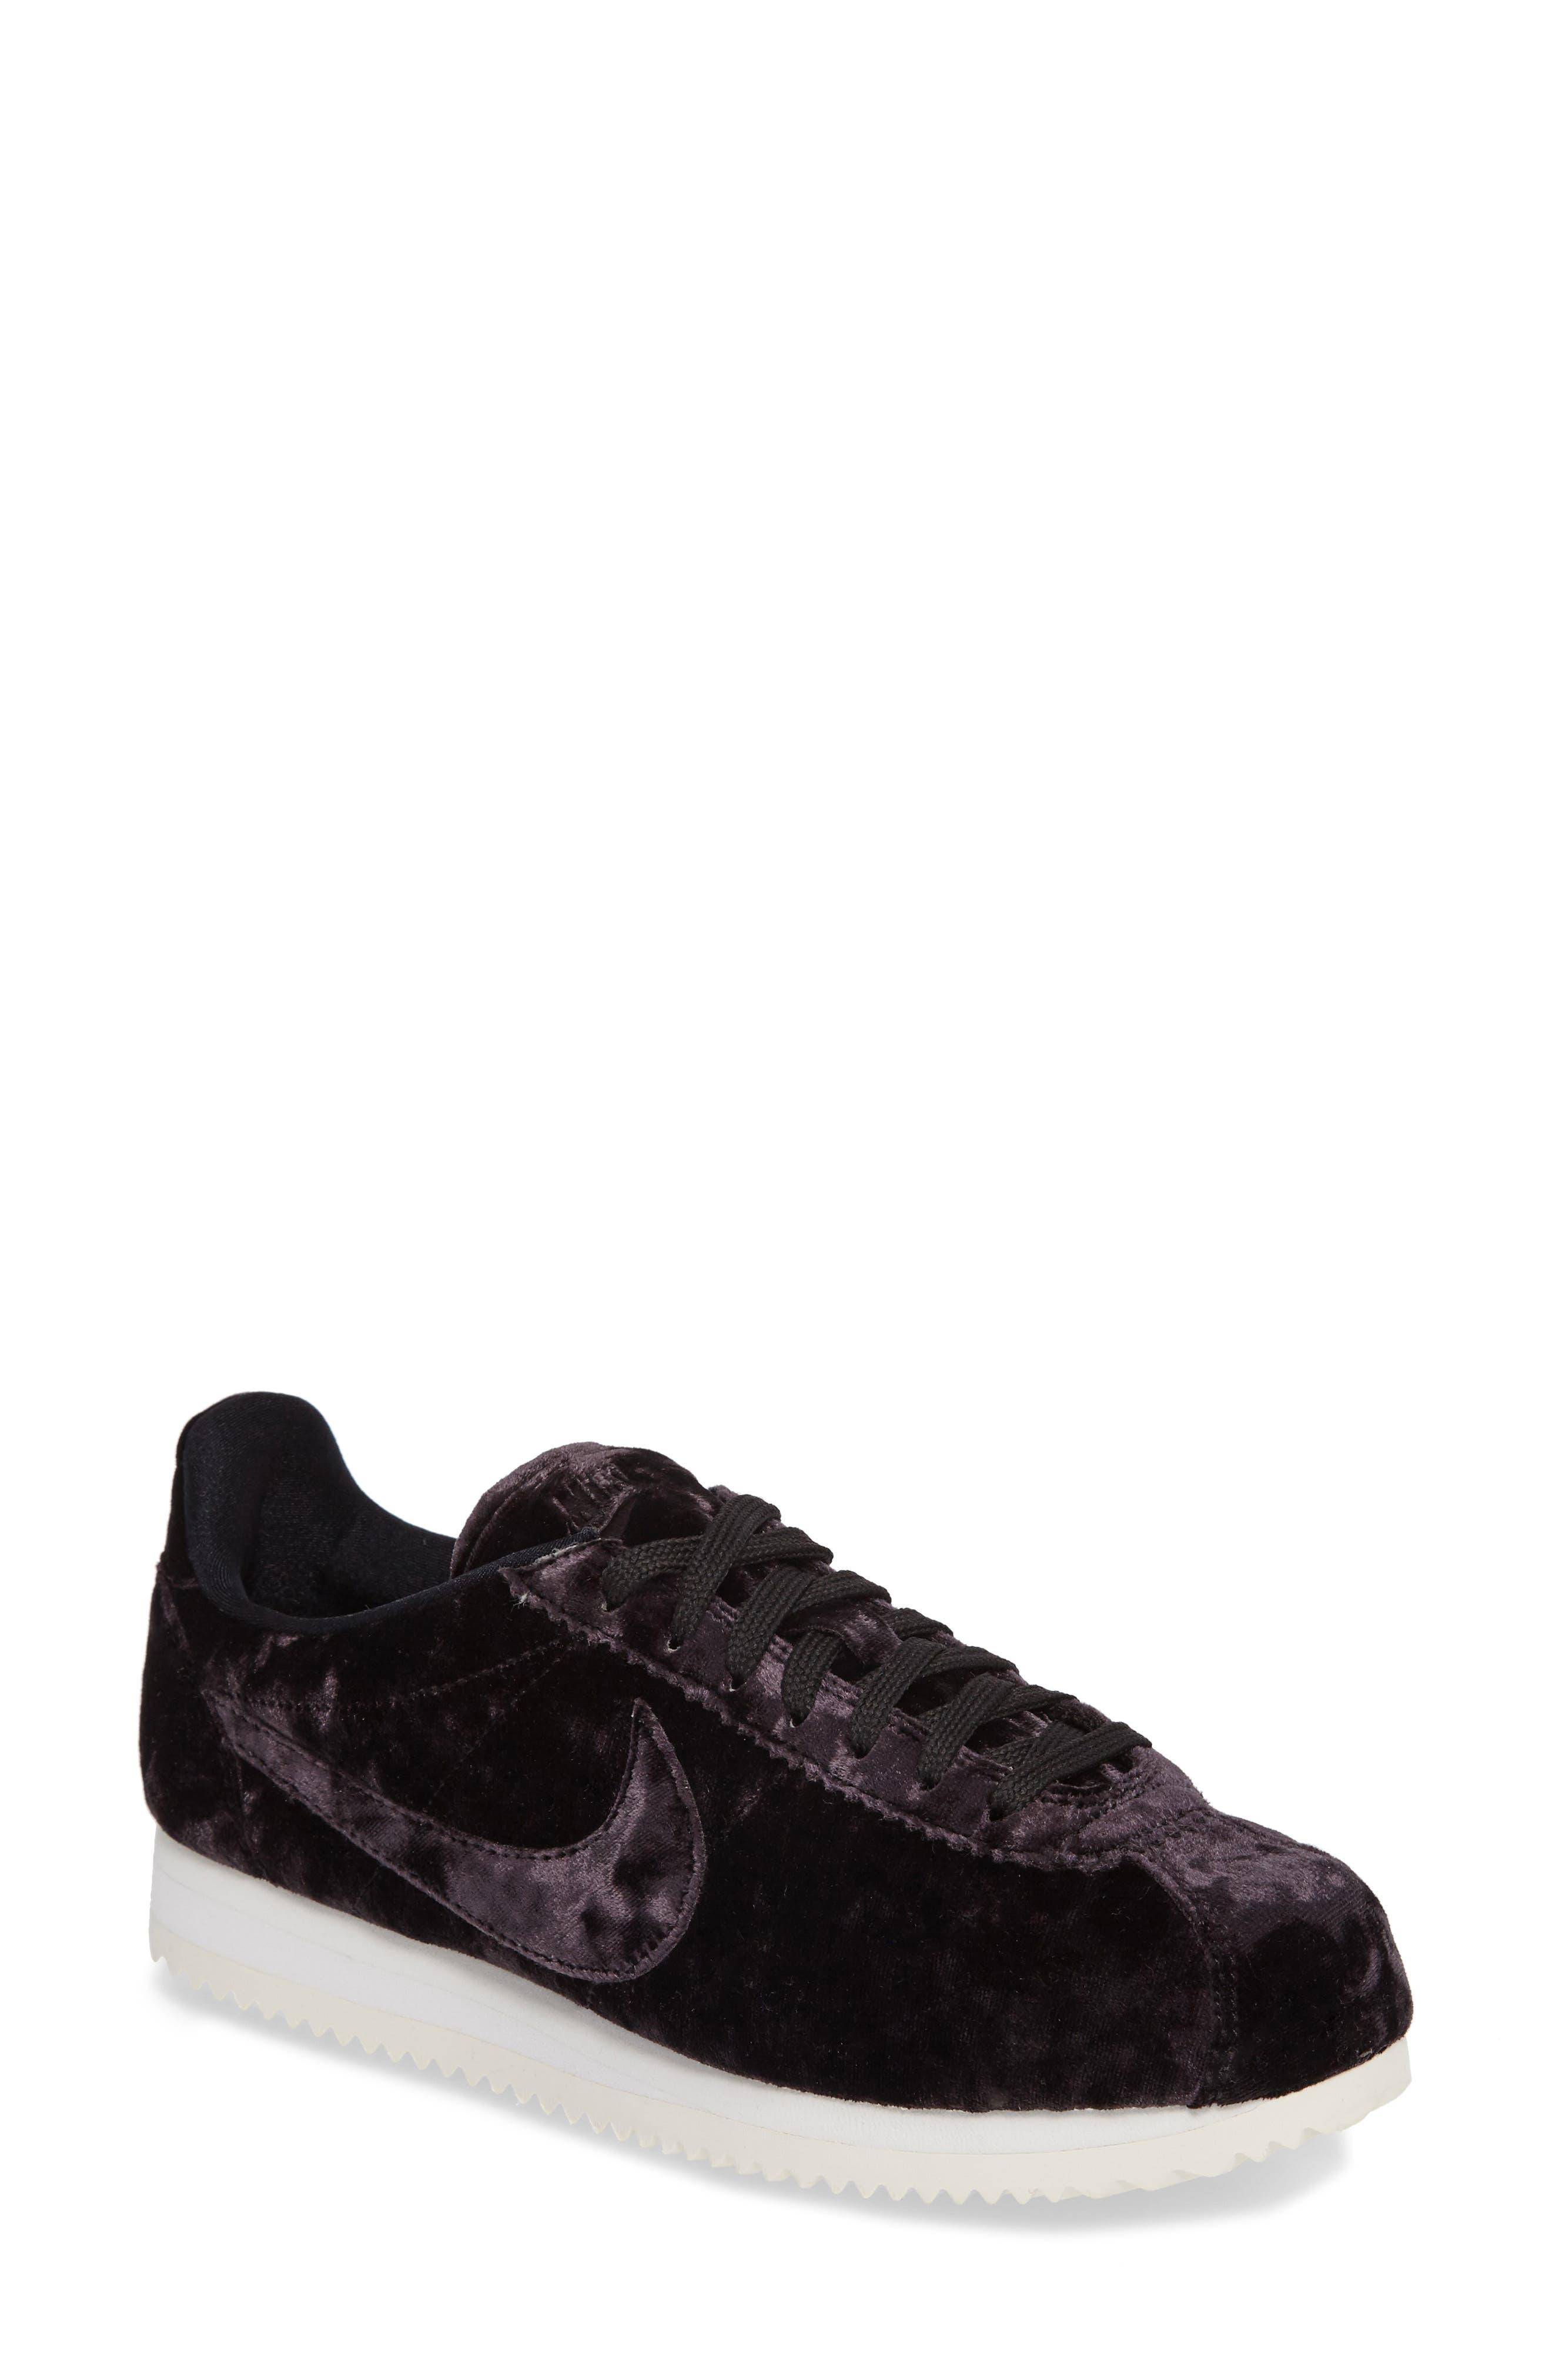 Cortez Classic LX Sneaker,                         Main,                         color, 001